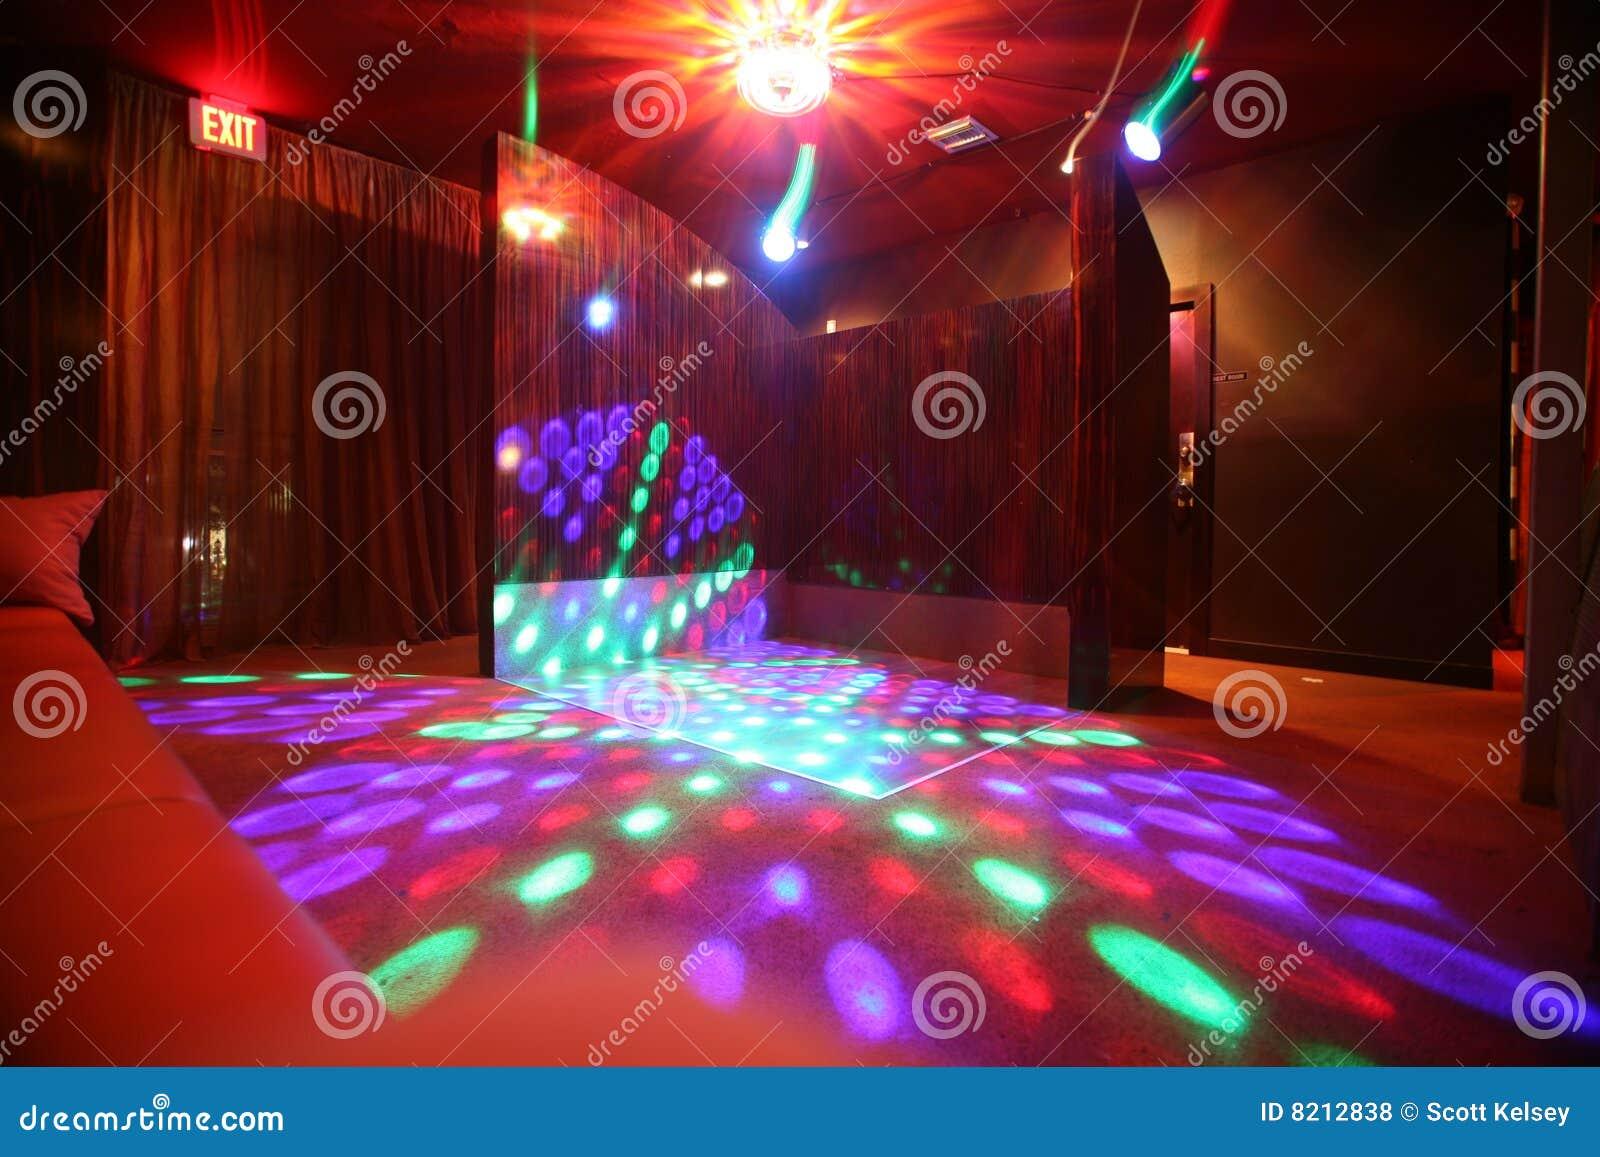 Empty Night Club